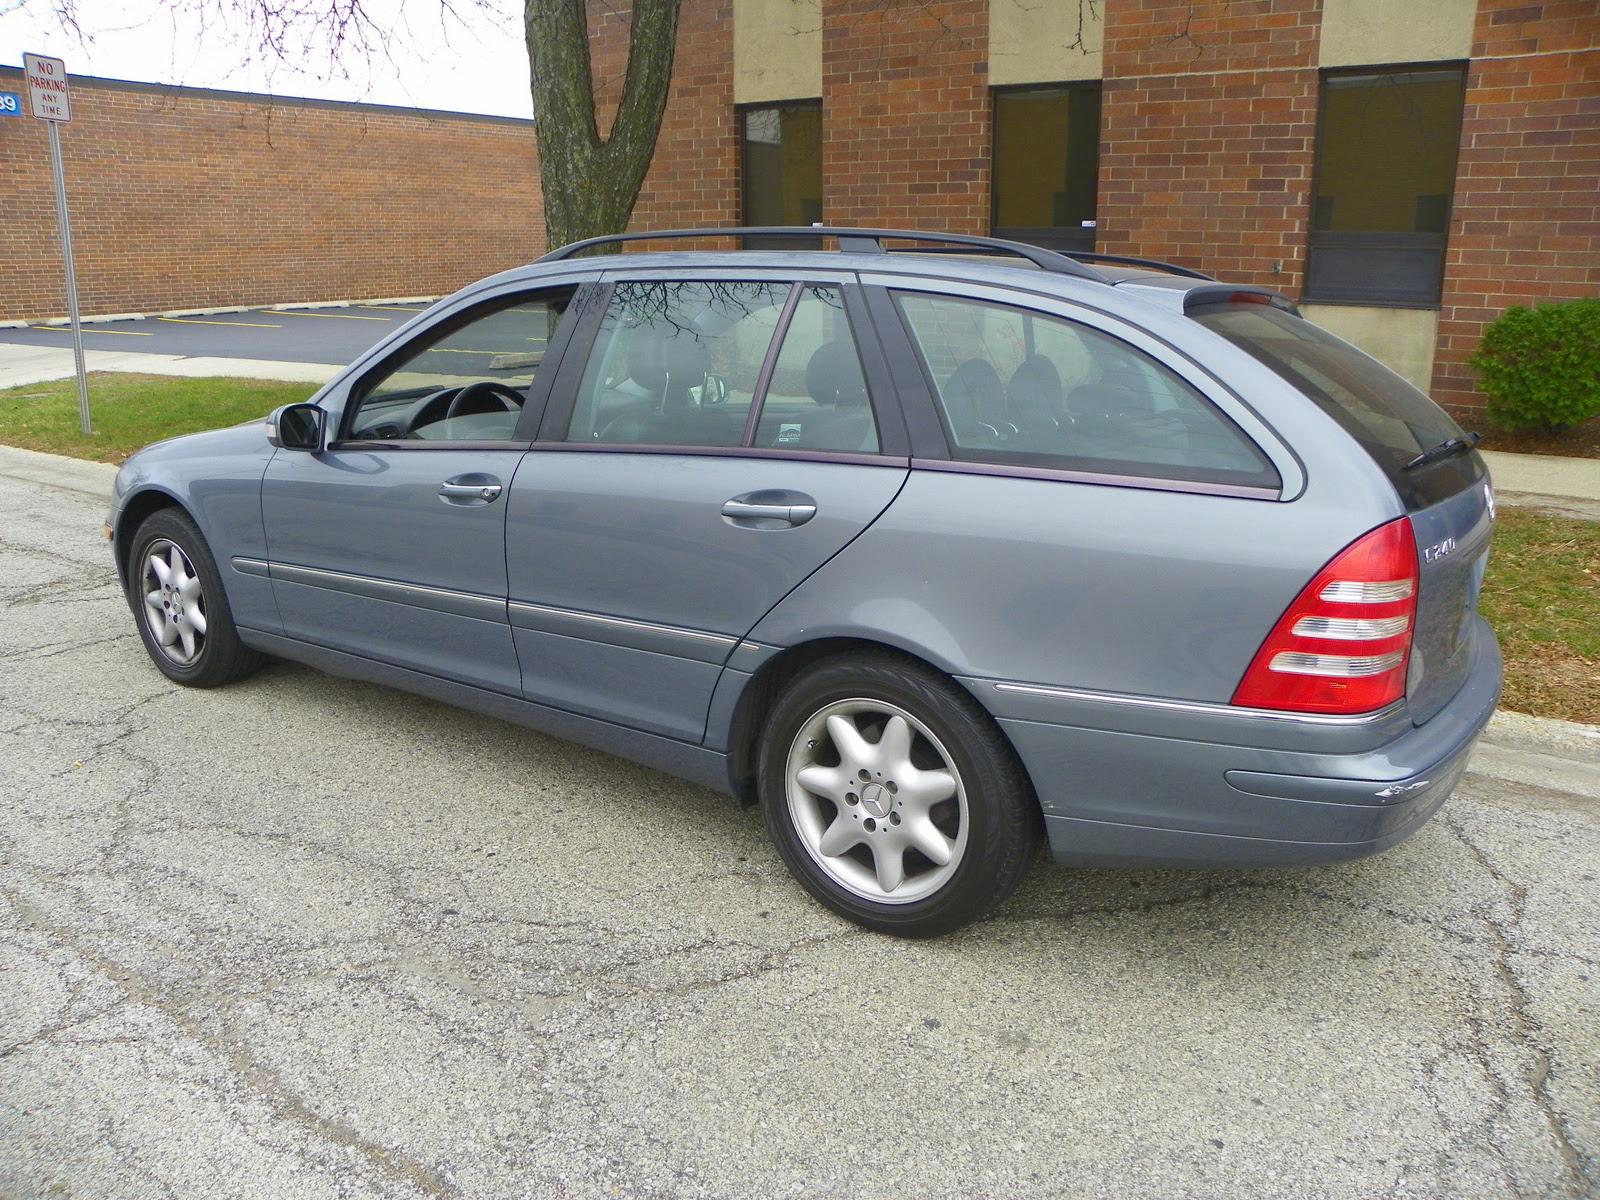 2004 Mercedes-Benz C-Class - Trim Information - CarGurus